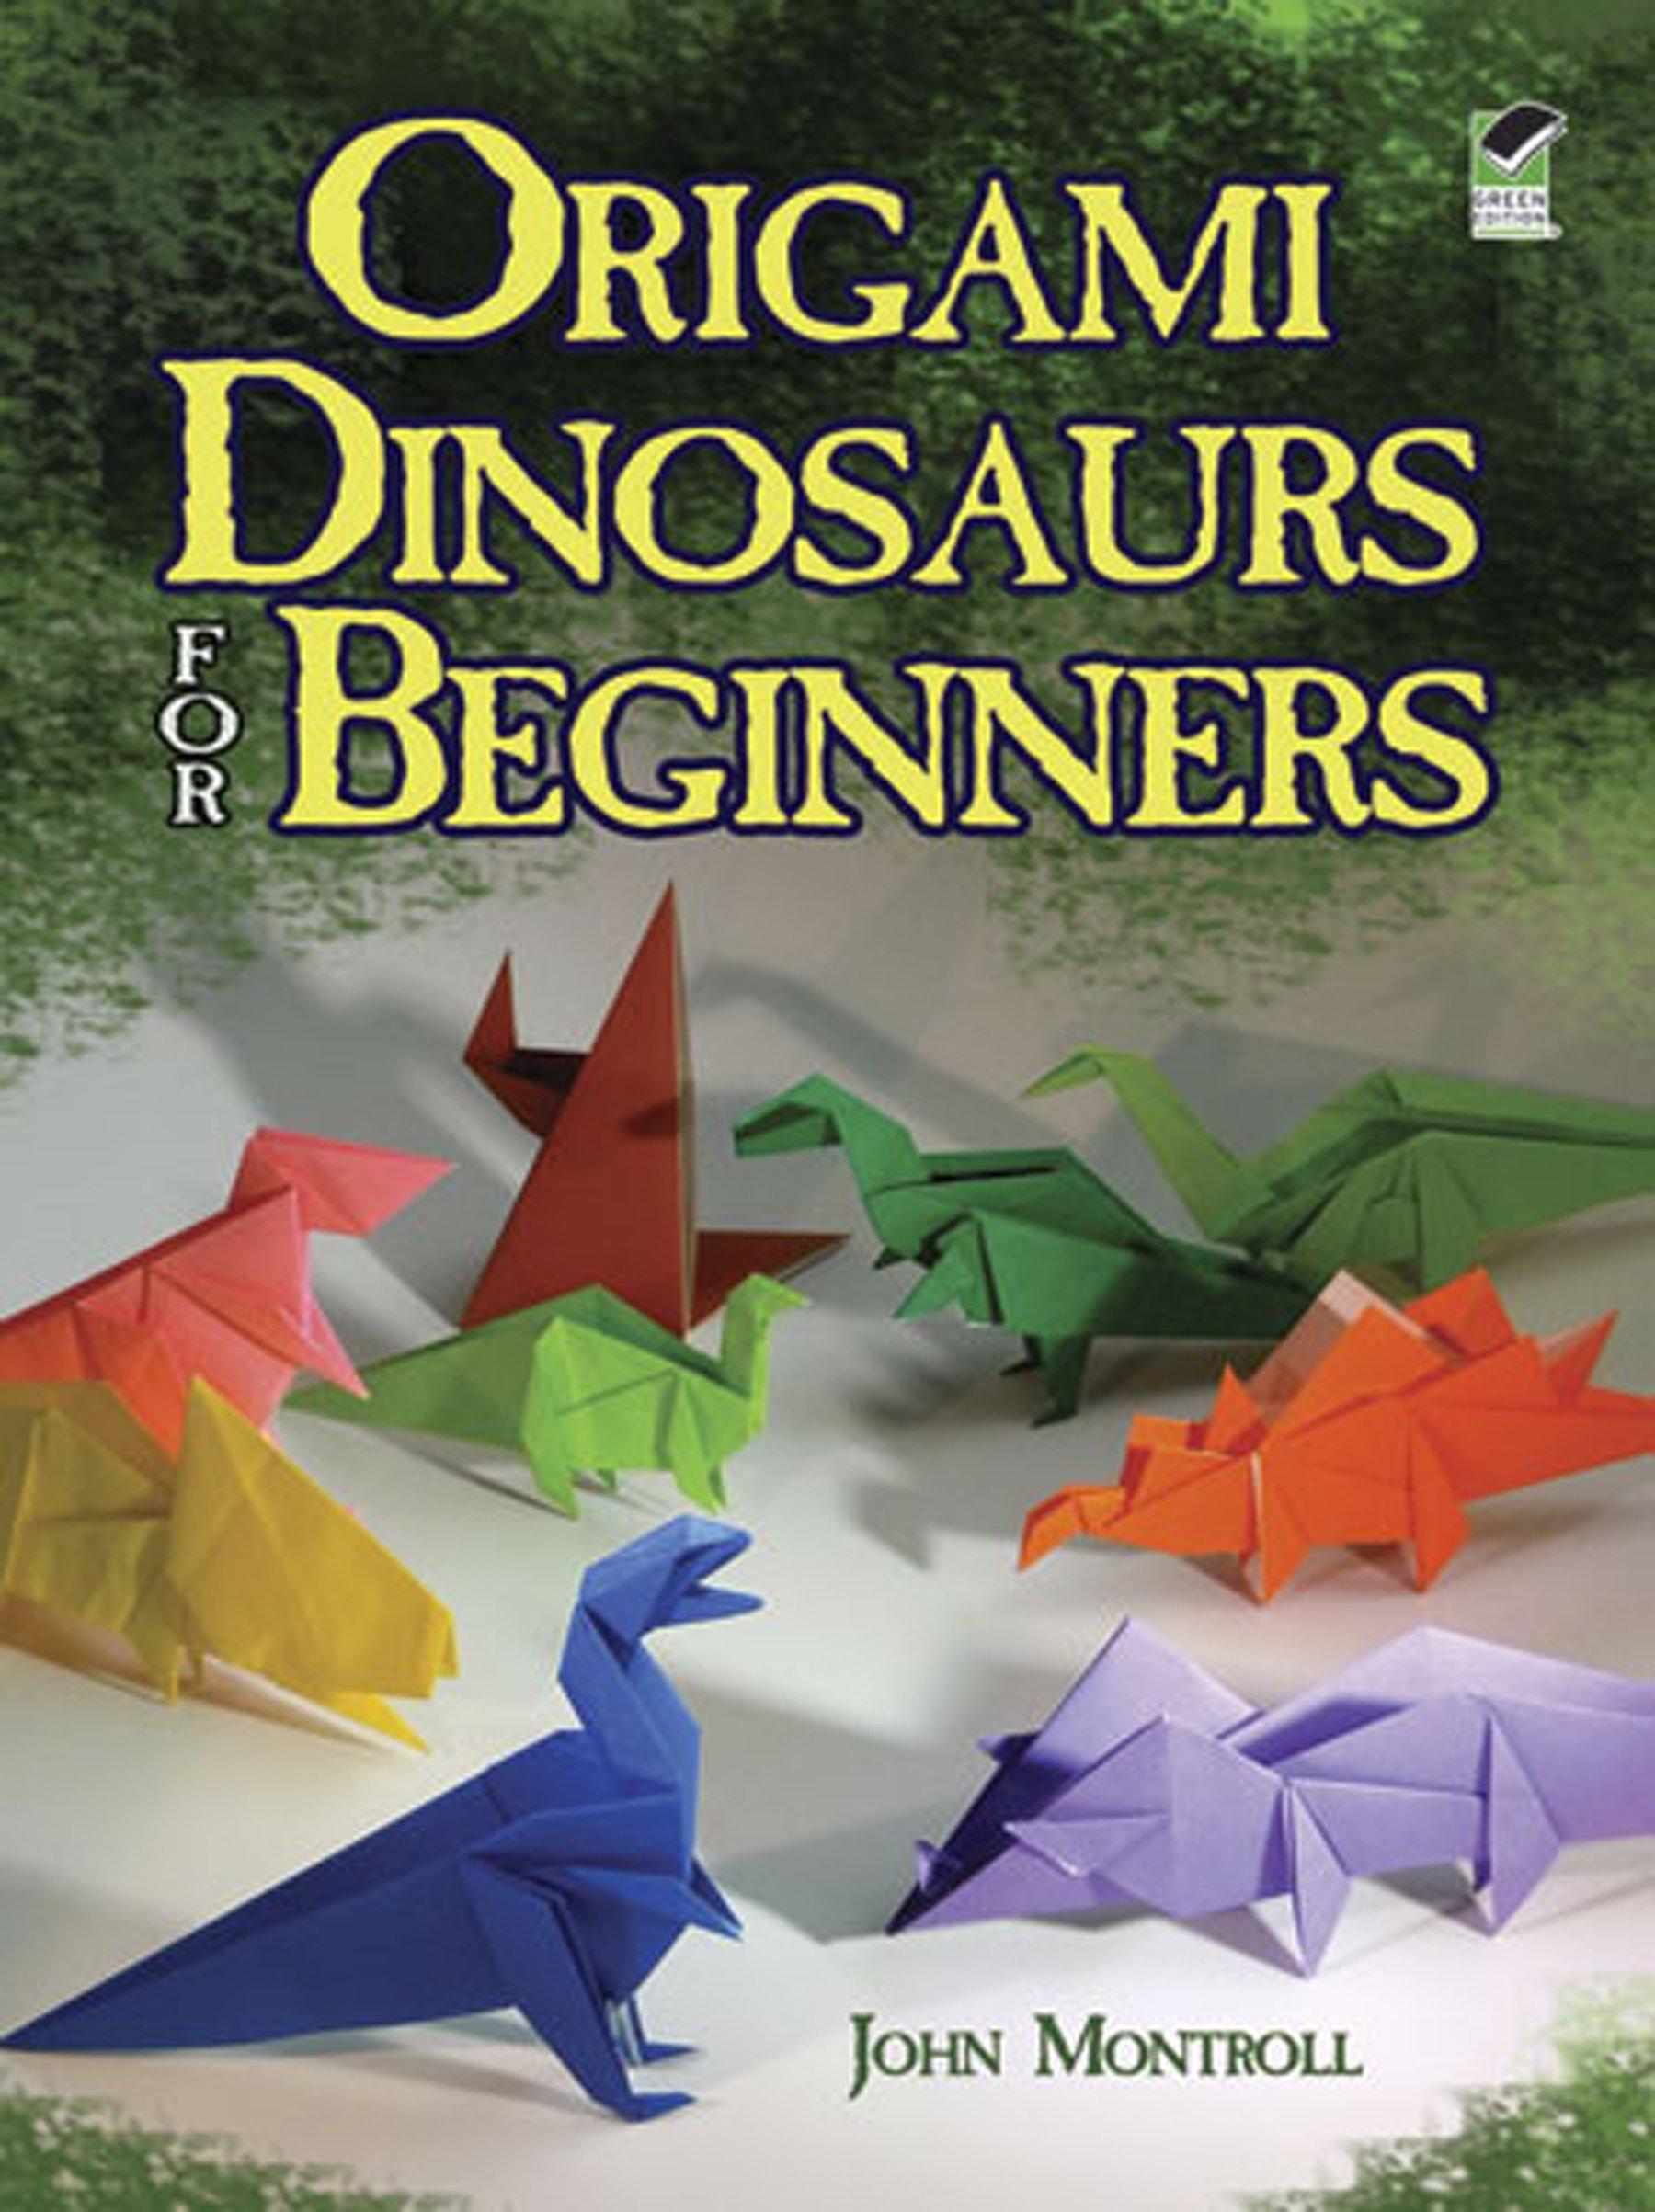 Easy origami dover origami papercraft amazon john origami dinosaurs for beginners dover origami papercraft jeuxipadfo Images